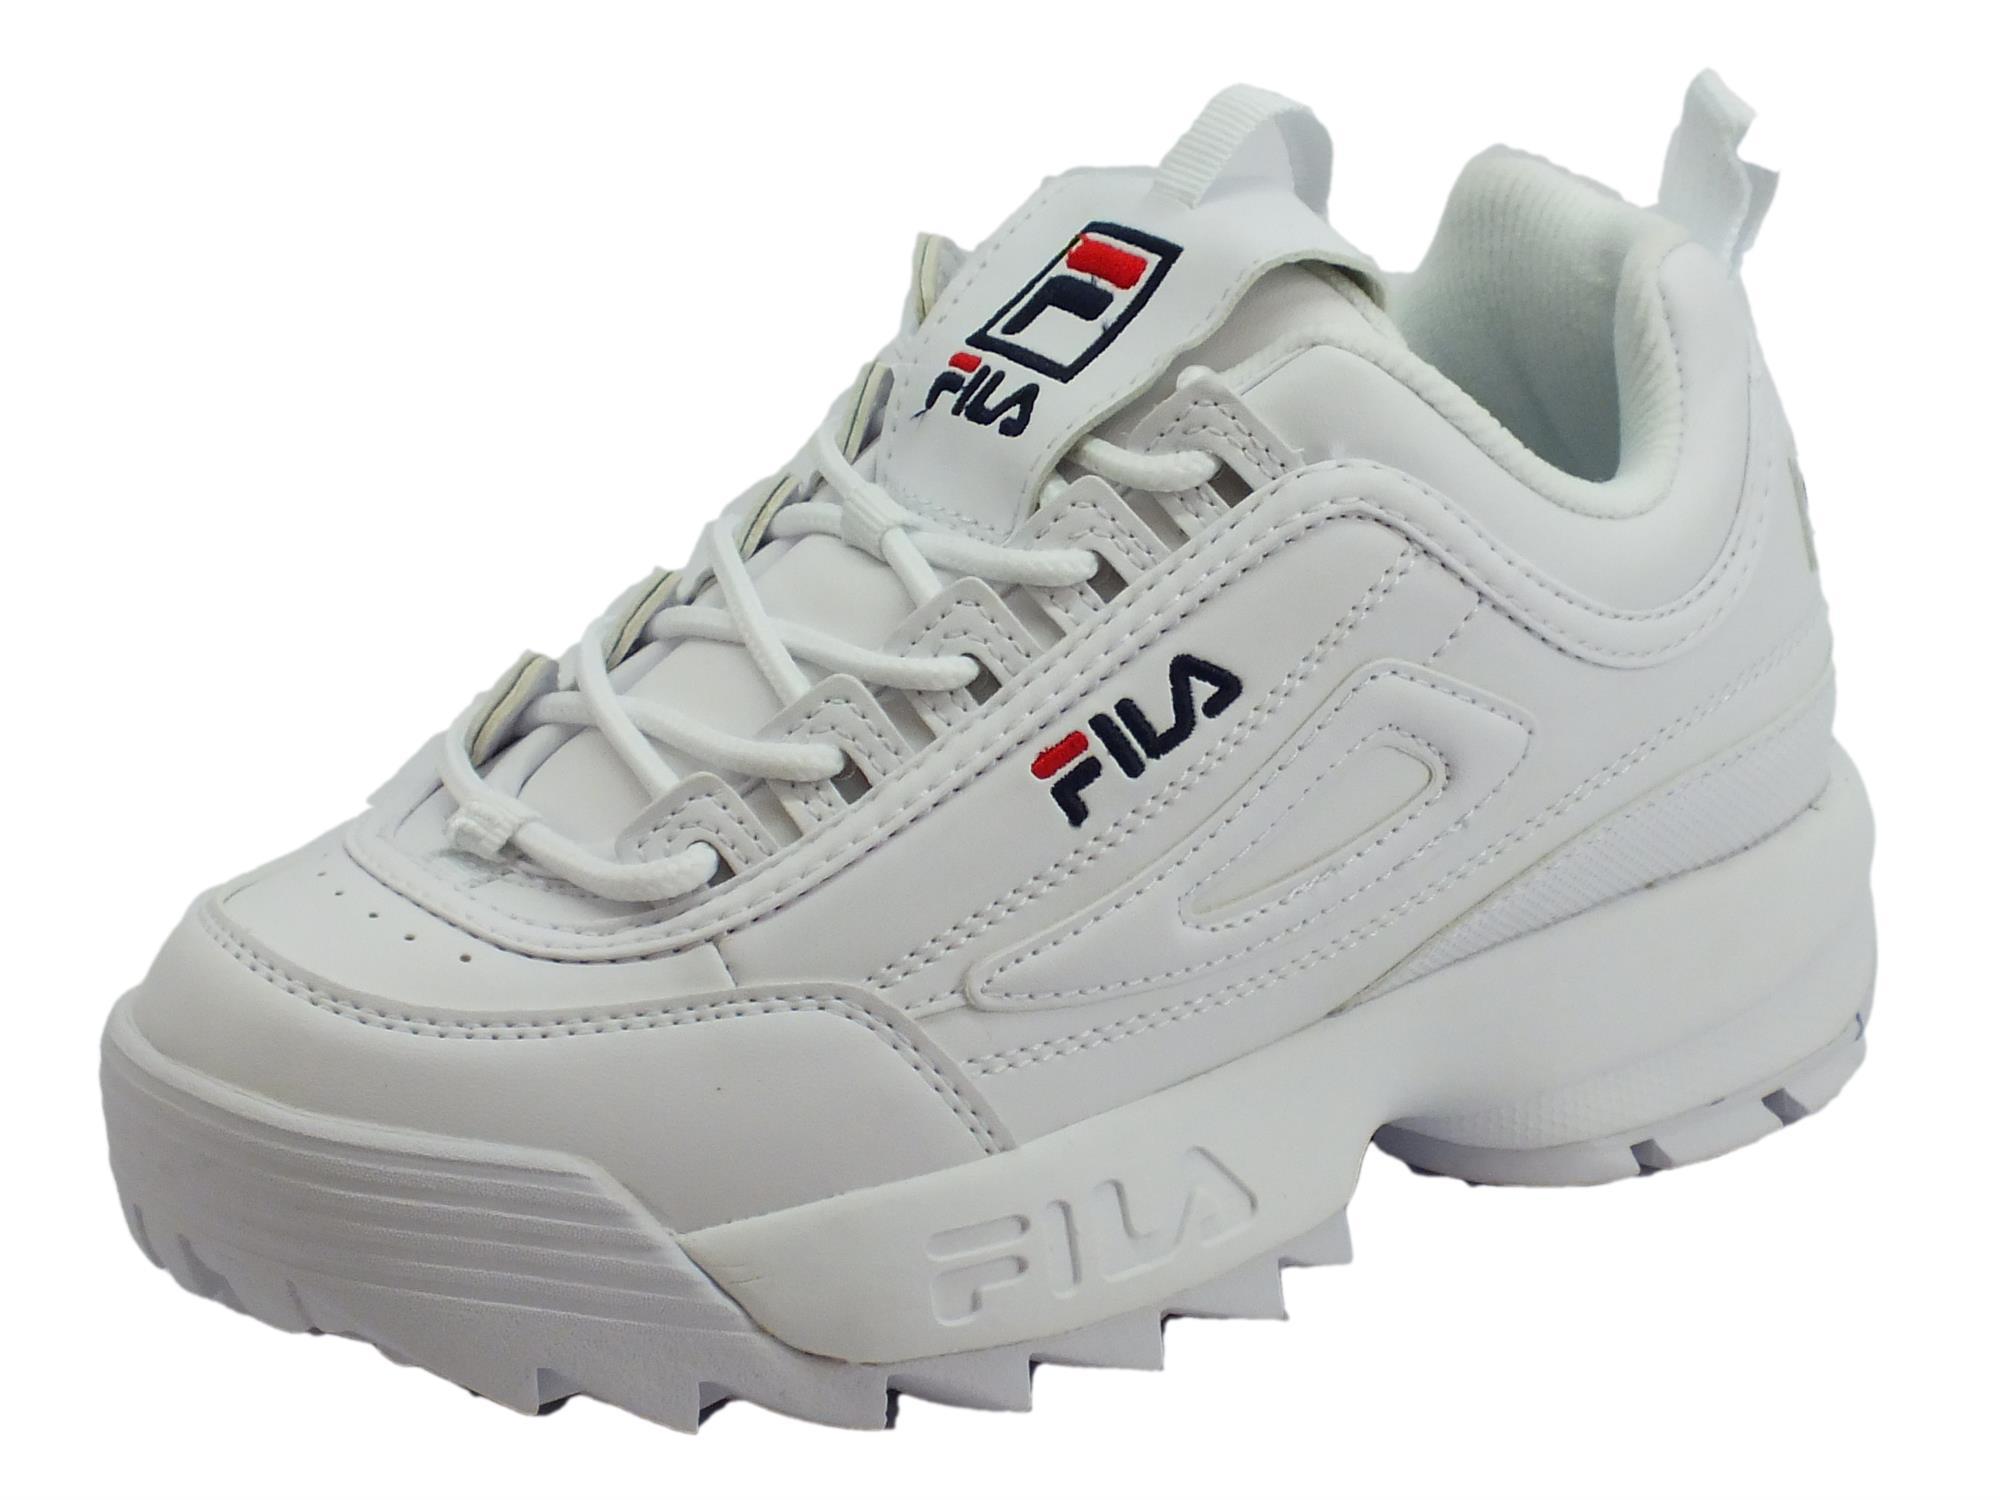 in vendita 46338 9a360 Fila 1010302.1FG Disruptor Low WMN White Scarpe sportive donna ecopelle  bianca zeppa alta